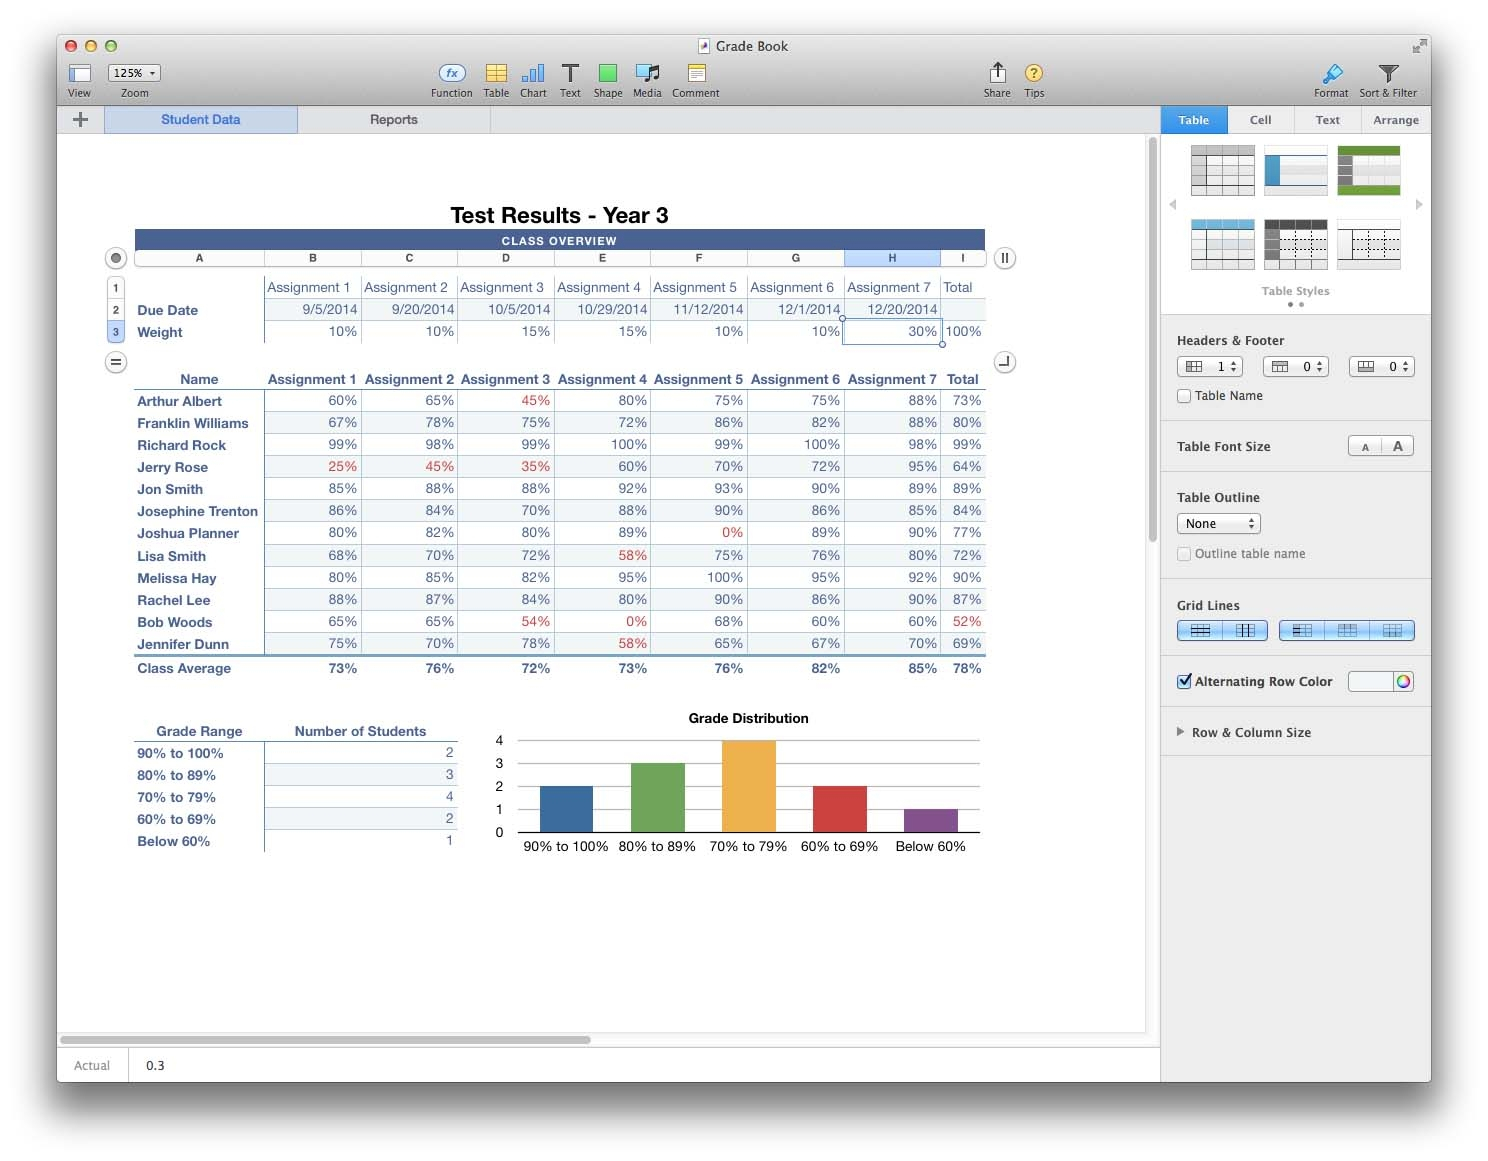 Best Spreadsheet App For Mac Intended For Best Mac Spreadsheet Apps Macworld Uk Apple Numbers 361 Free